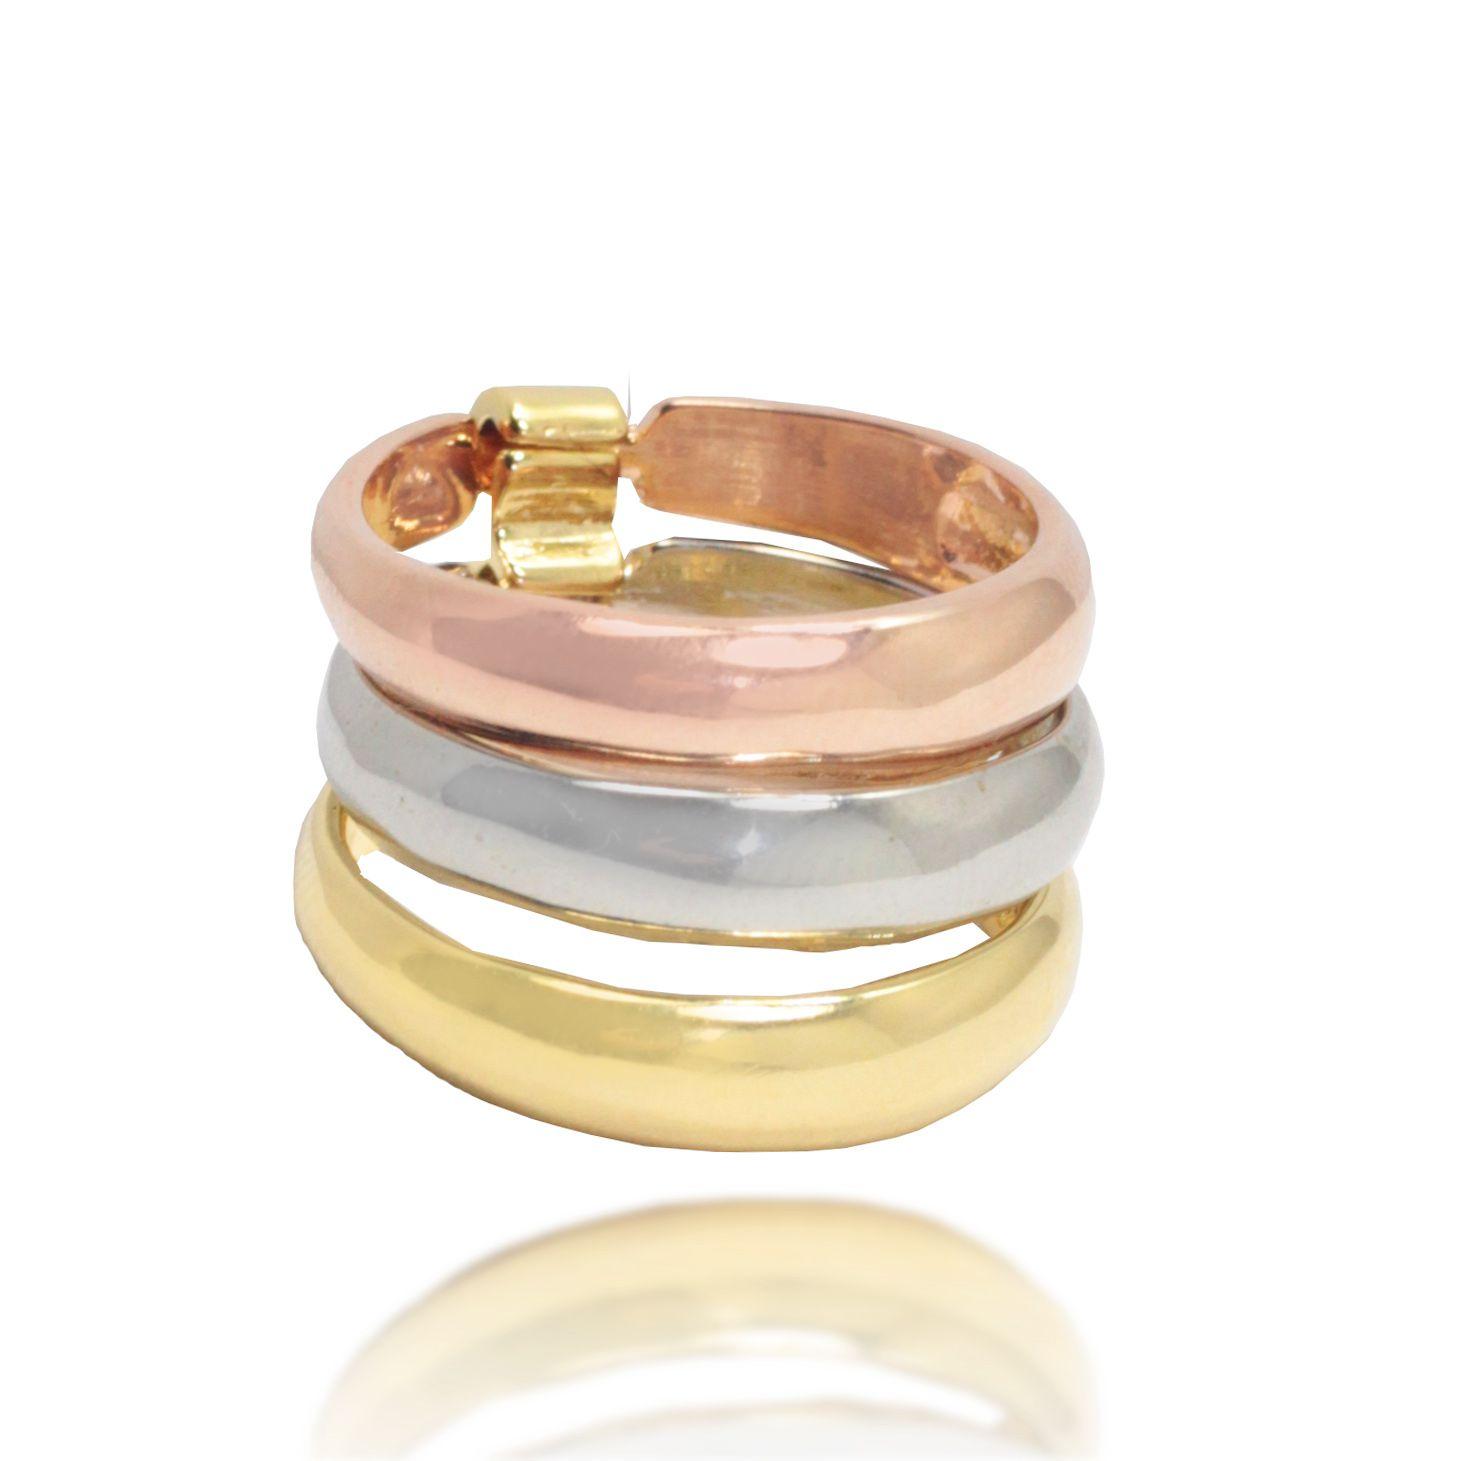 Anel Triplo Folheado Ouro 18k + Prata + Rosé